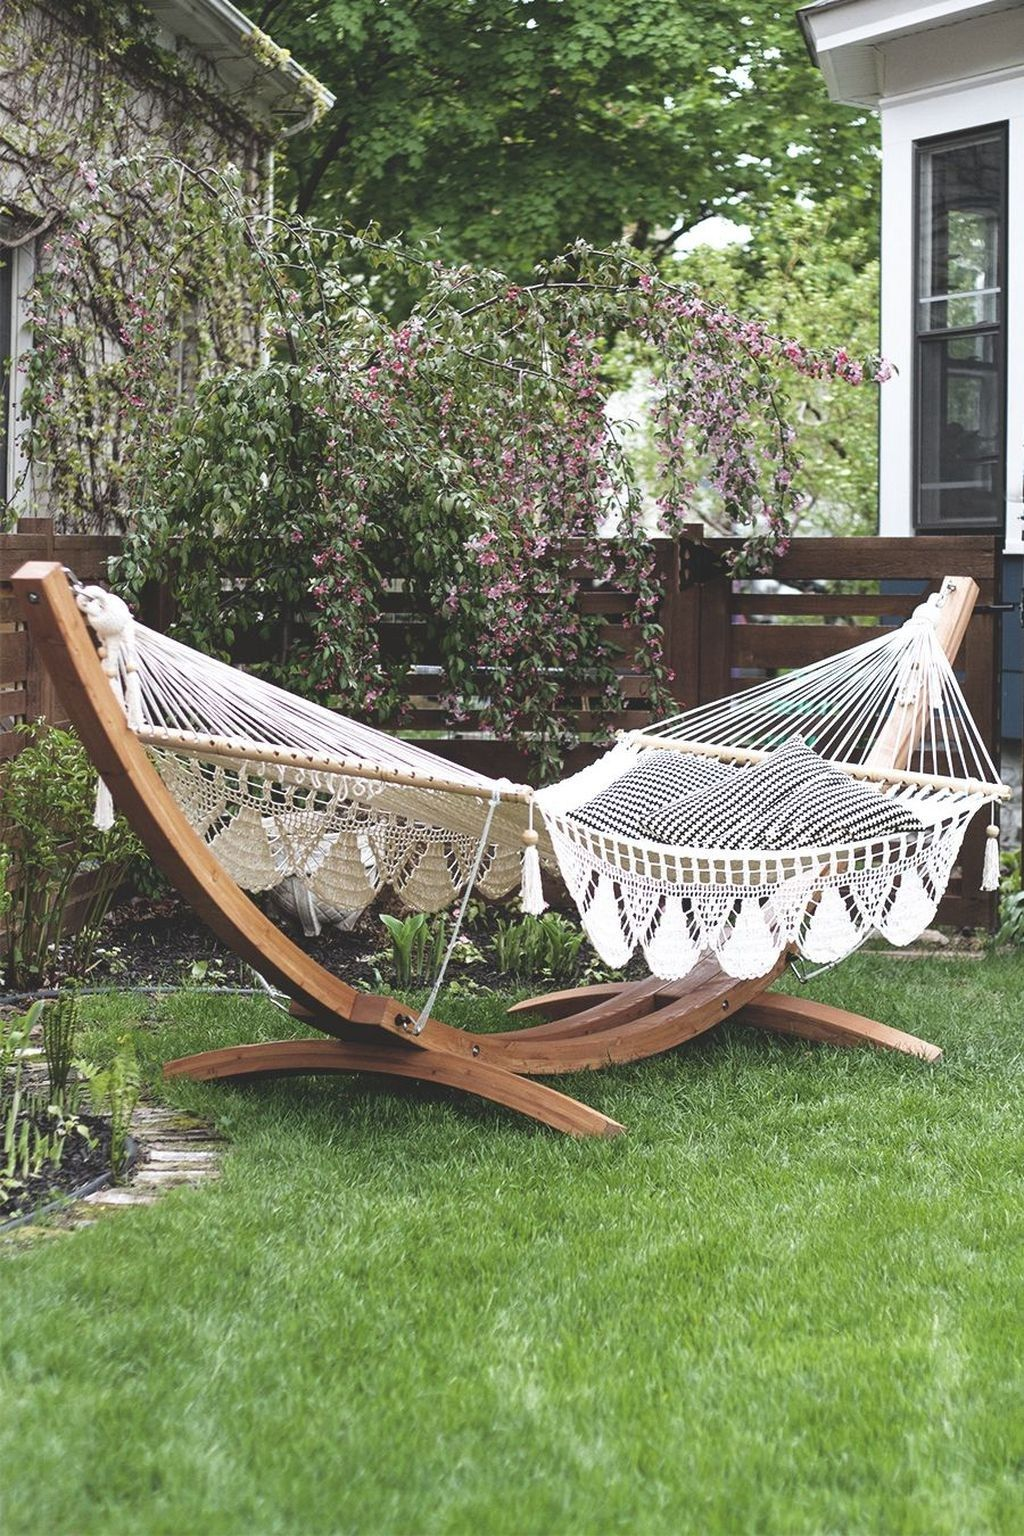 36 The Best Backyard Hammock Ideas For Relaxation Popy Home Backyard Hammock Diy Hammock Backyard